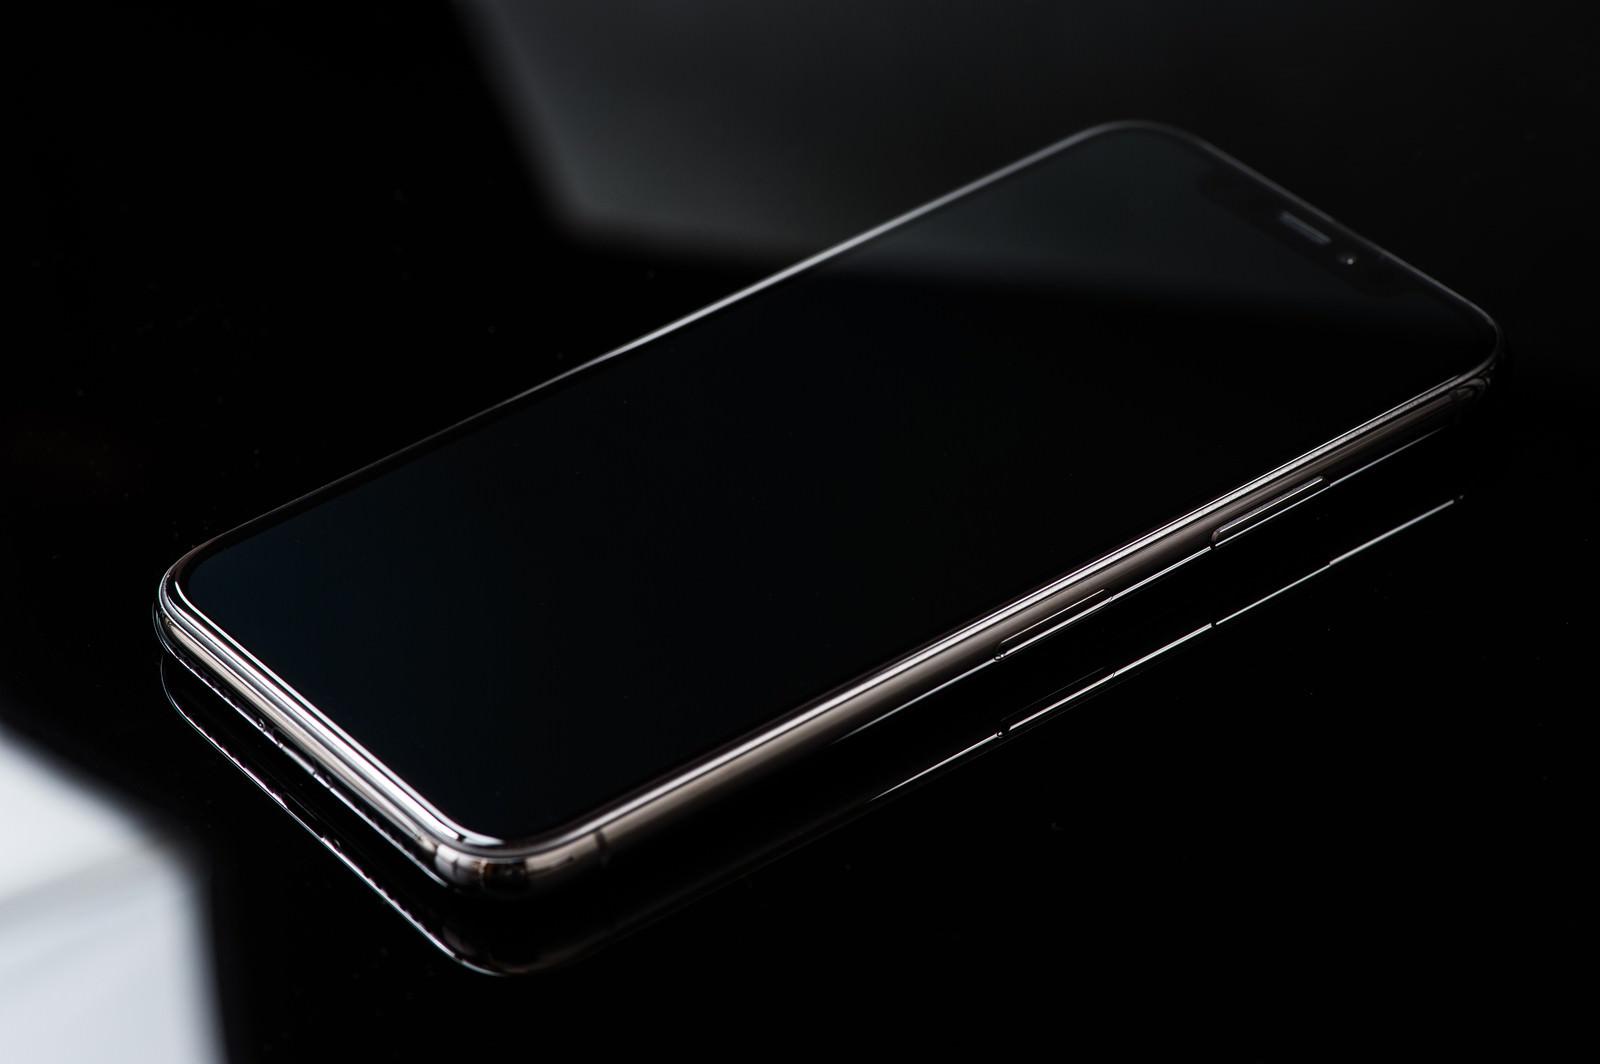 「iPhone X と映り込む照明の光 | 写真の無料素材・フリー素材 - ぱくたそ」の写真